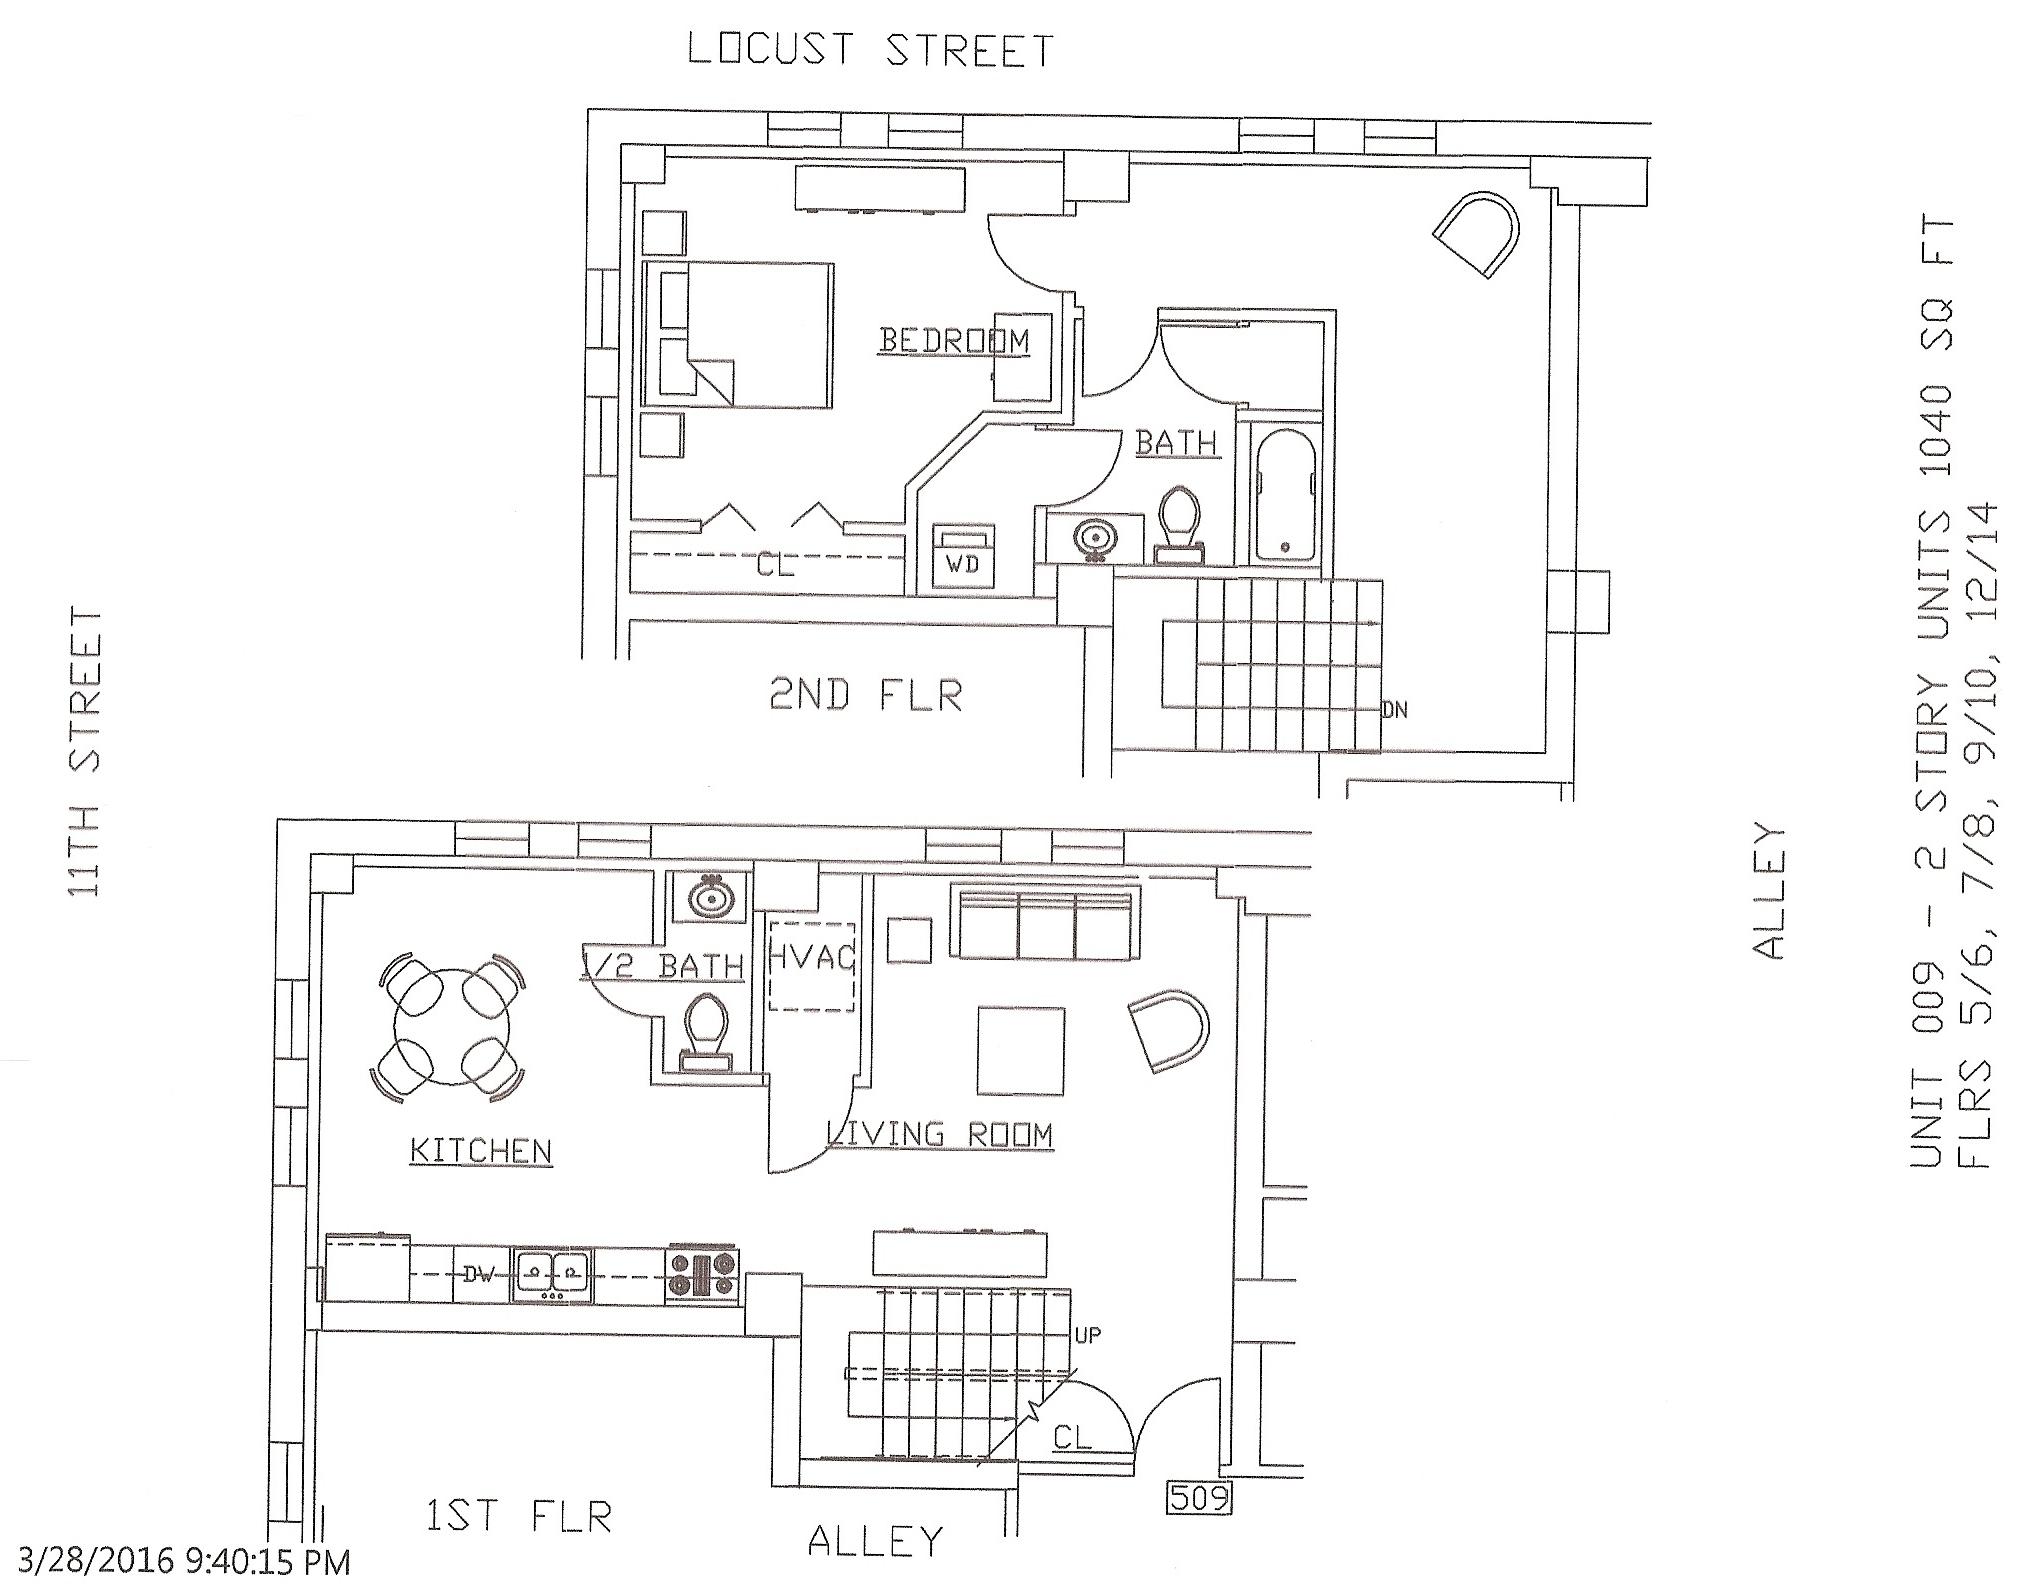 Unit 09, 1040 Square Feet